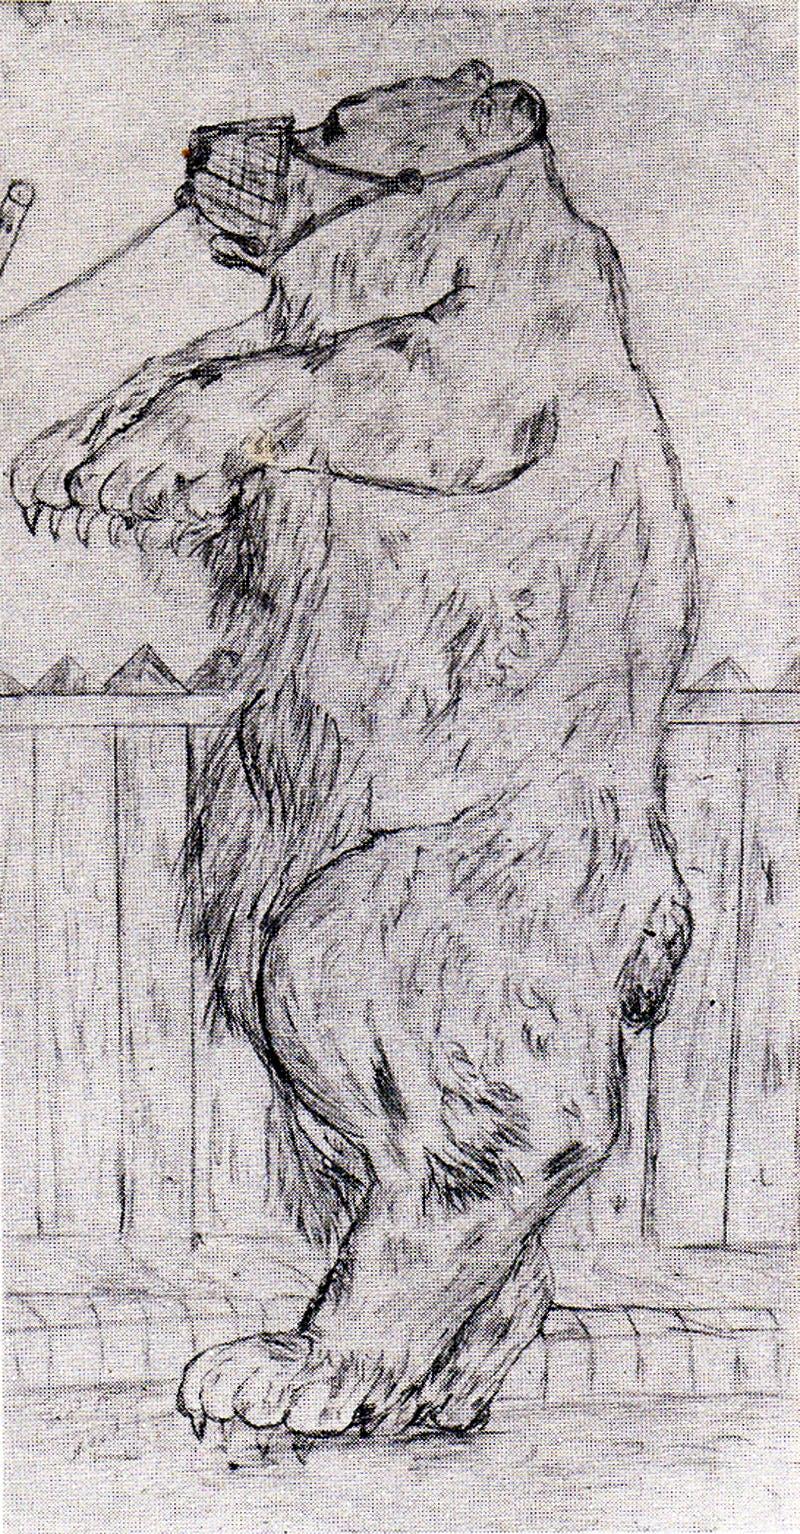 (1902), David Jones.